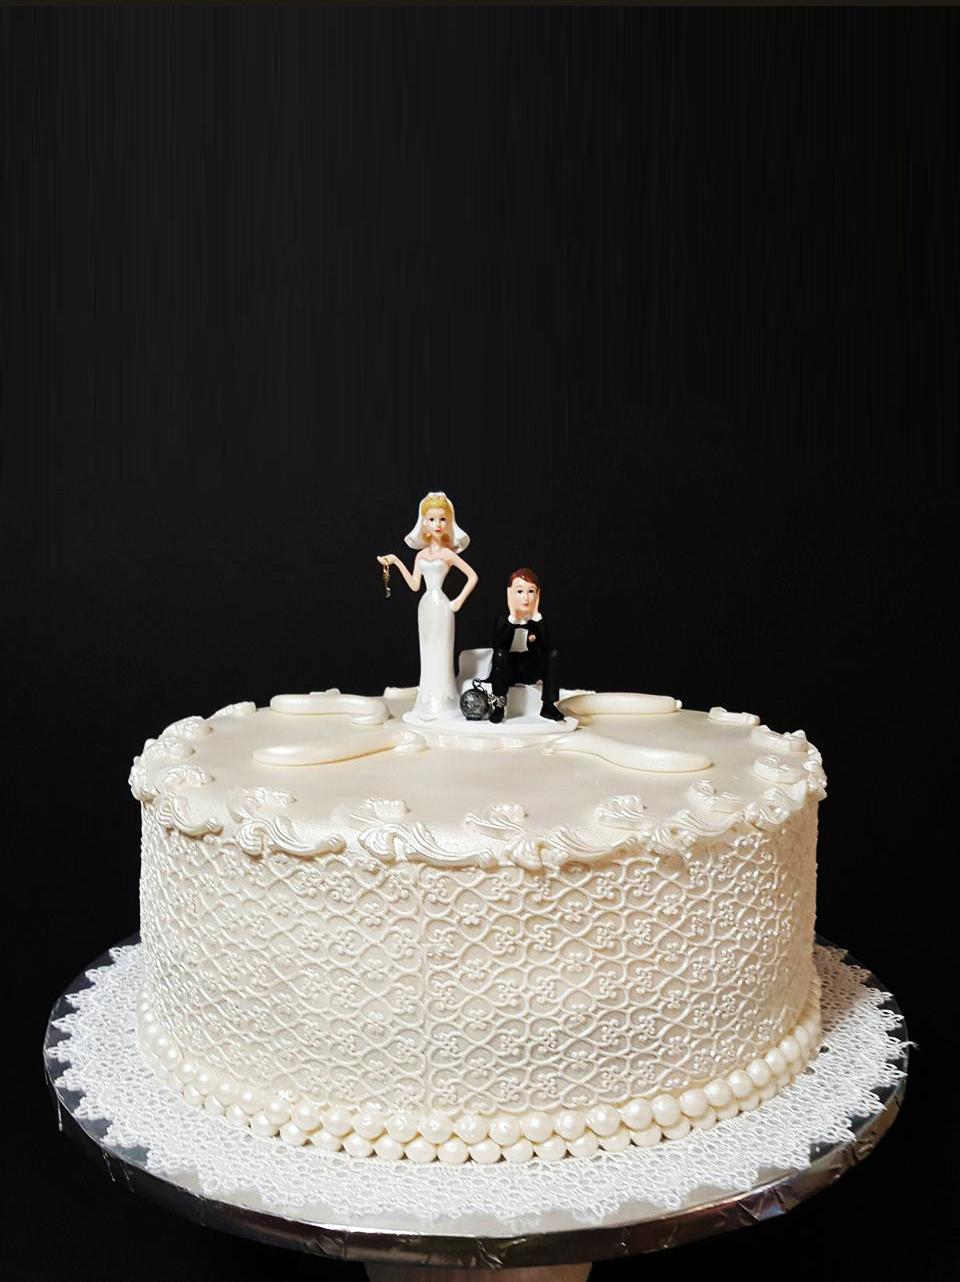 Fios de Mel by Elizabete Costa Cakes and Sweet New York -  1 tier lace wedding cake.jpg